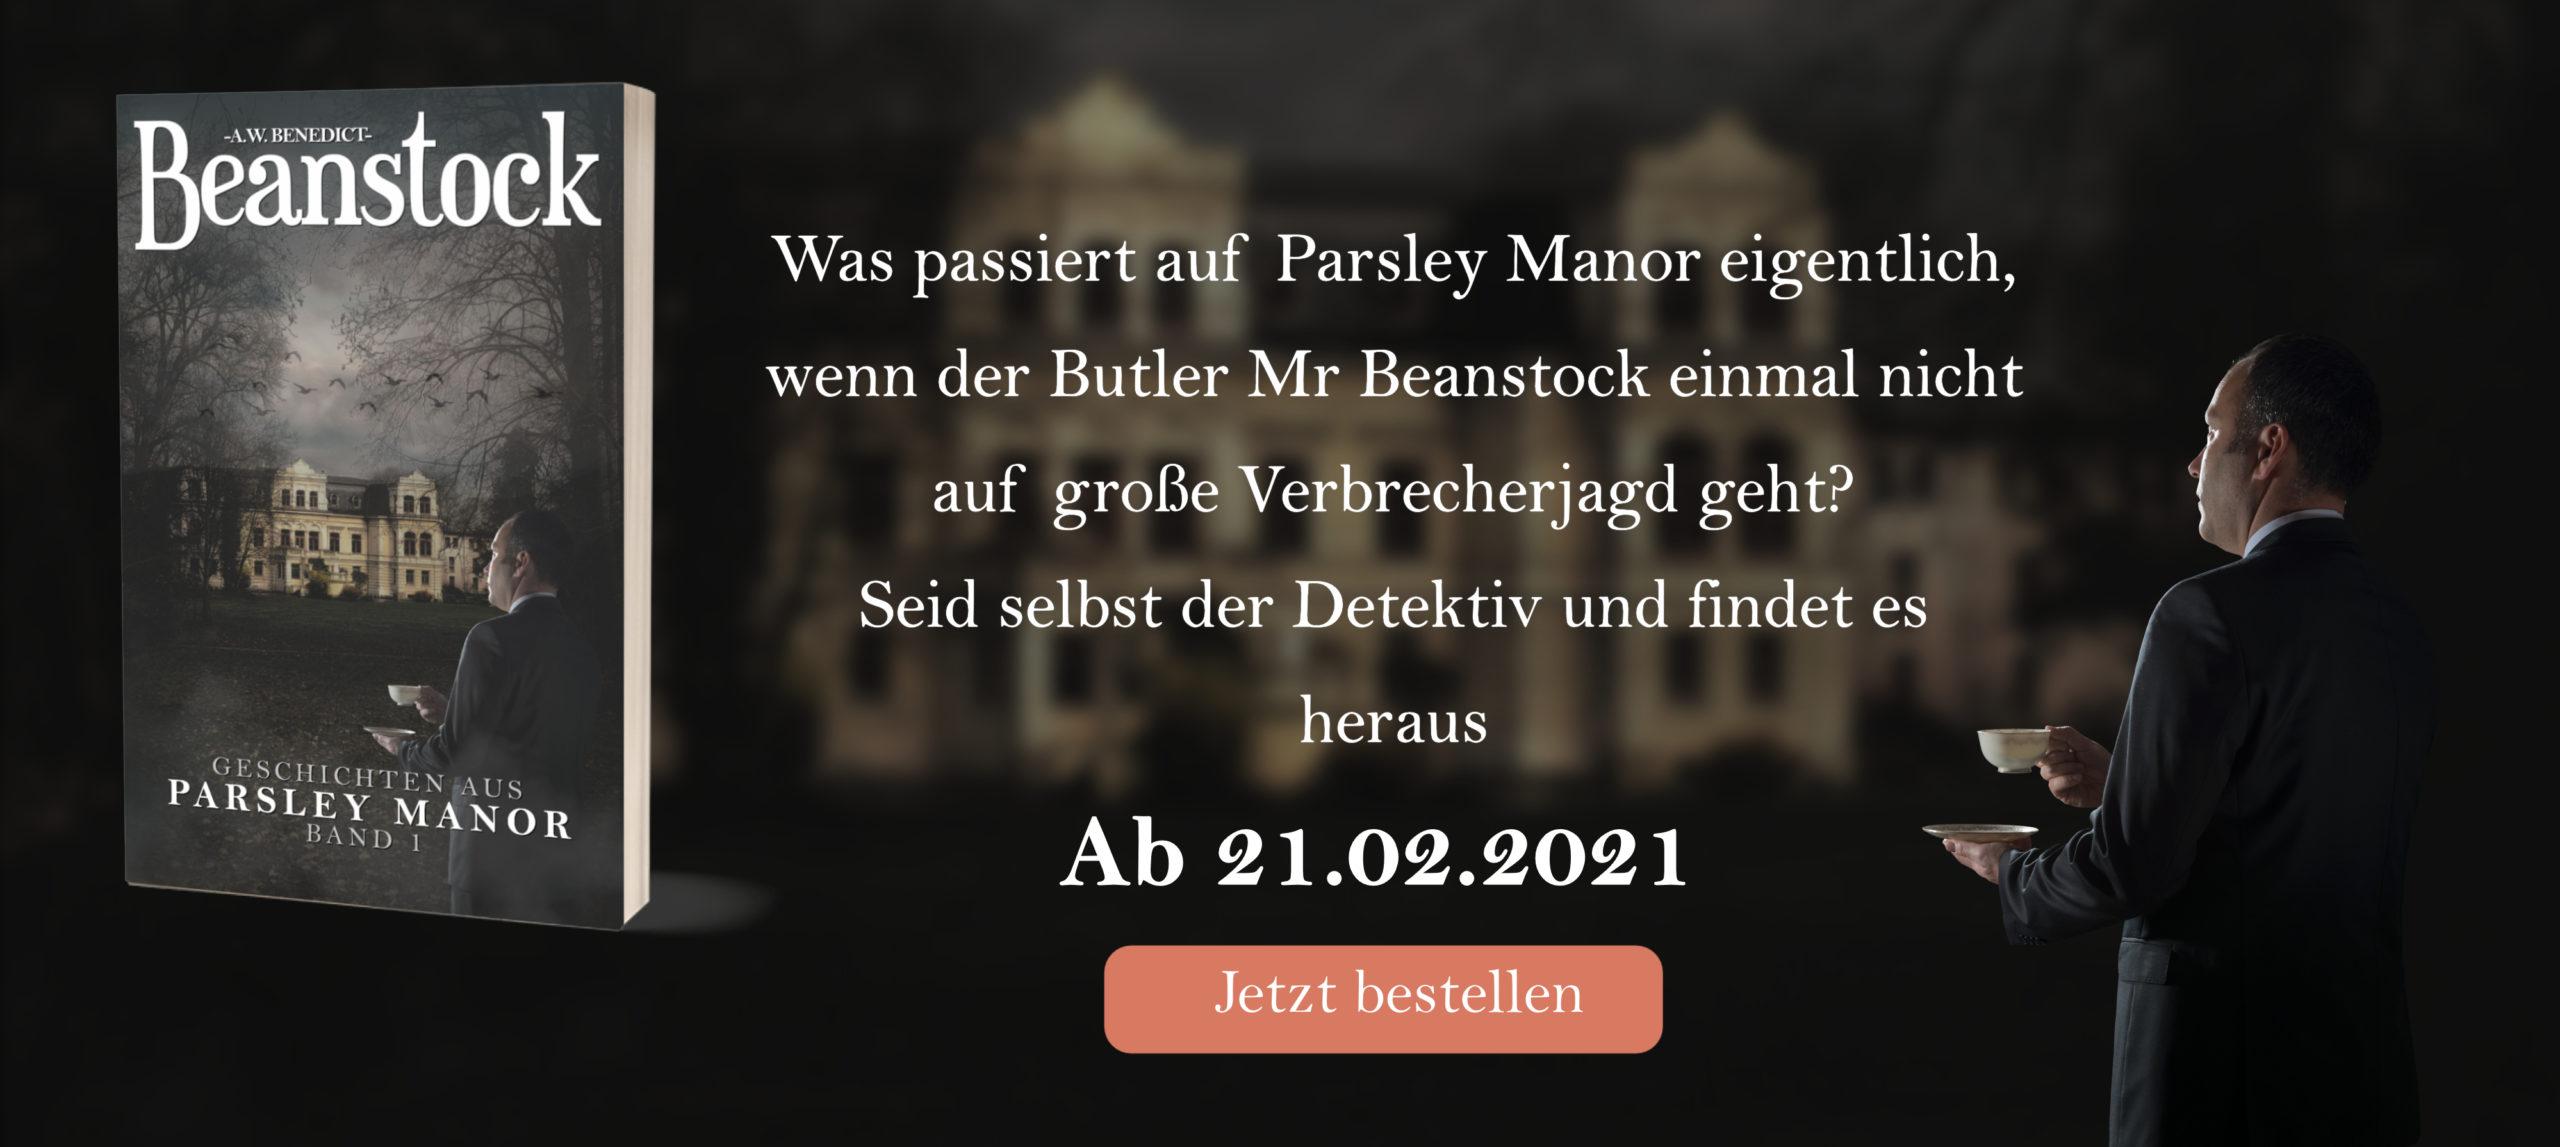 Beanstock - Geschichten aus Parsley Manor Band 1